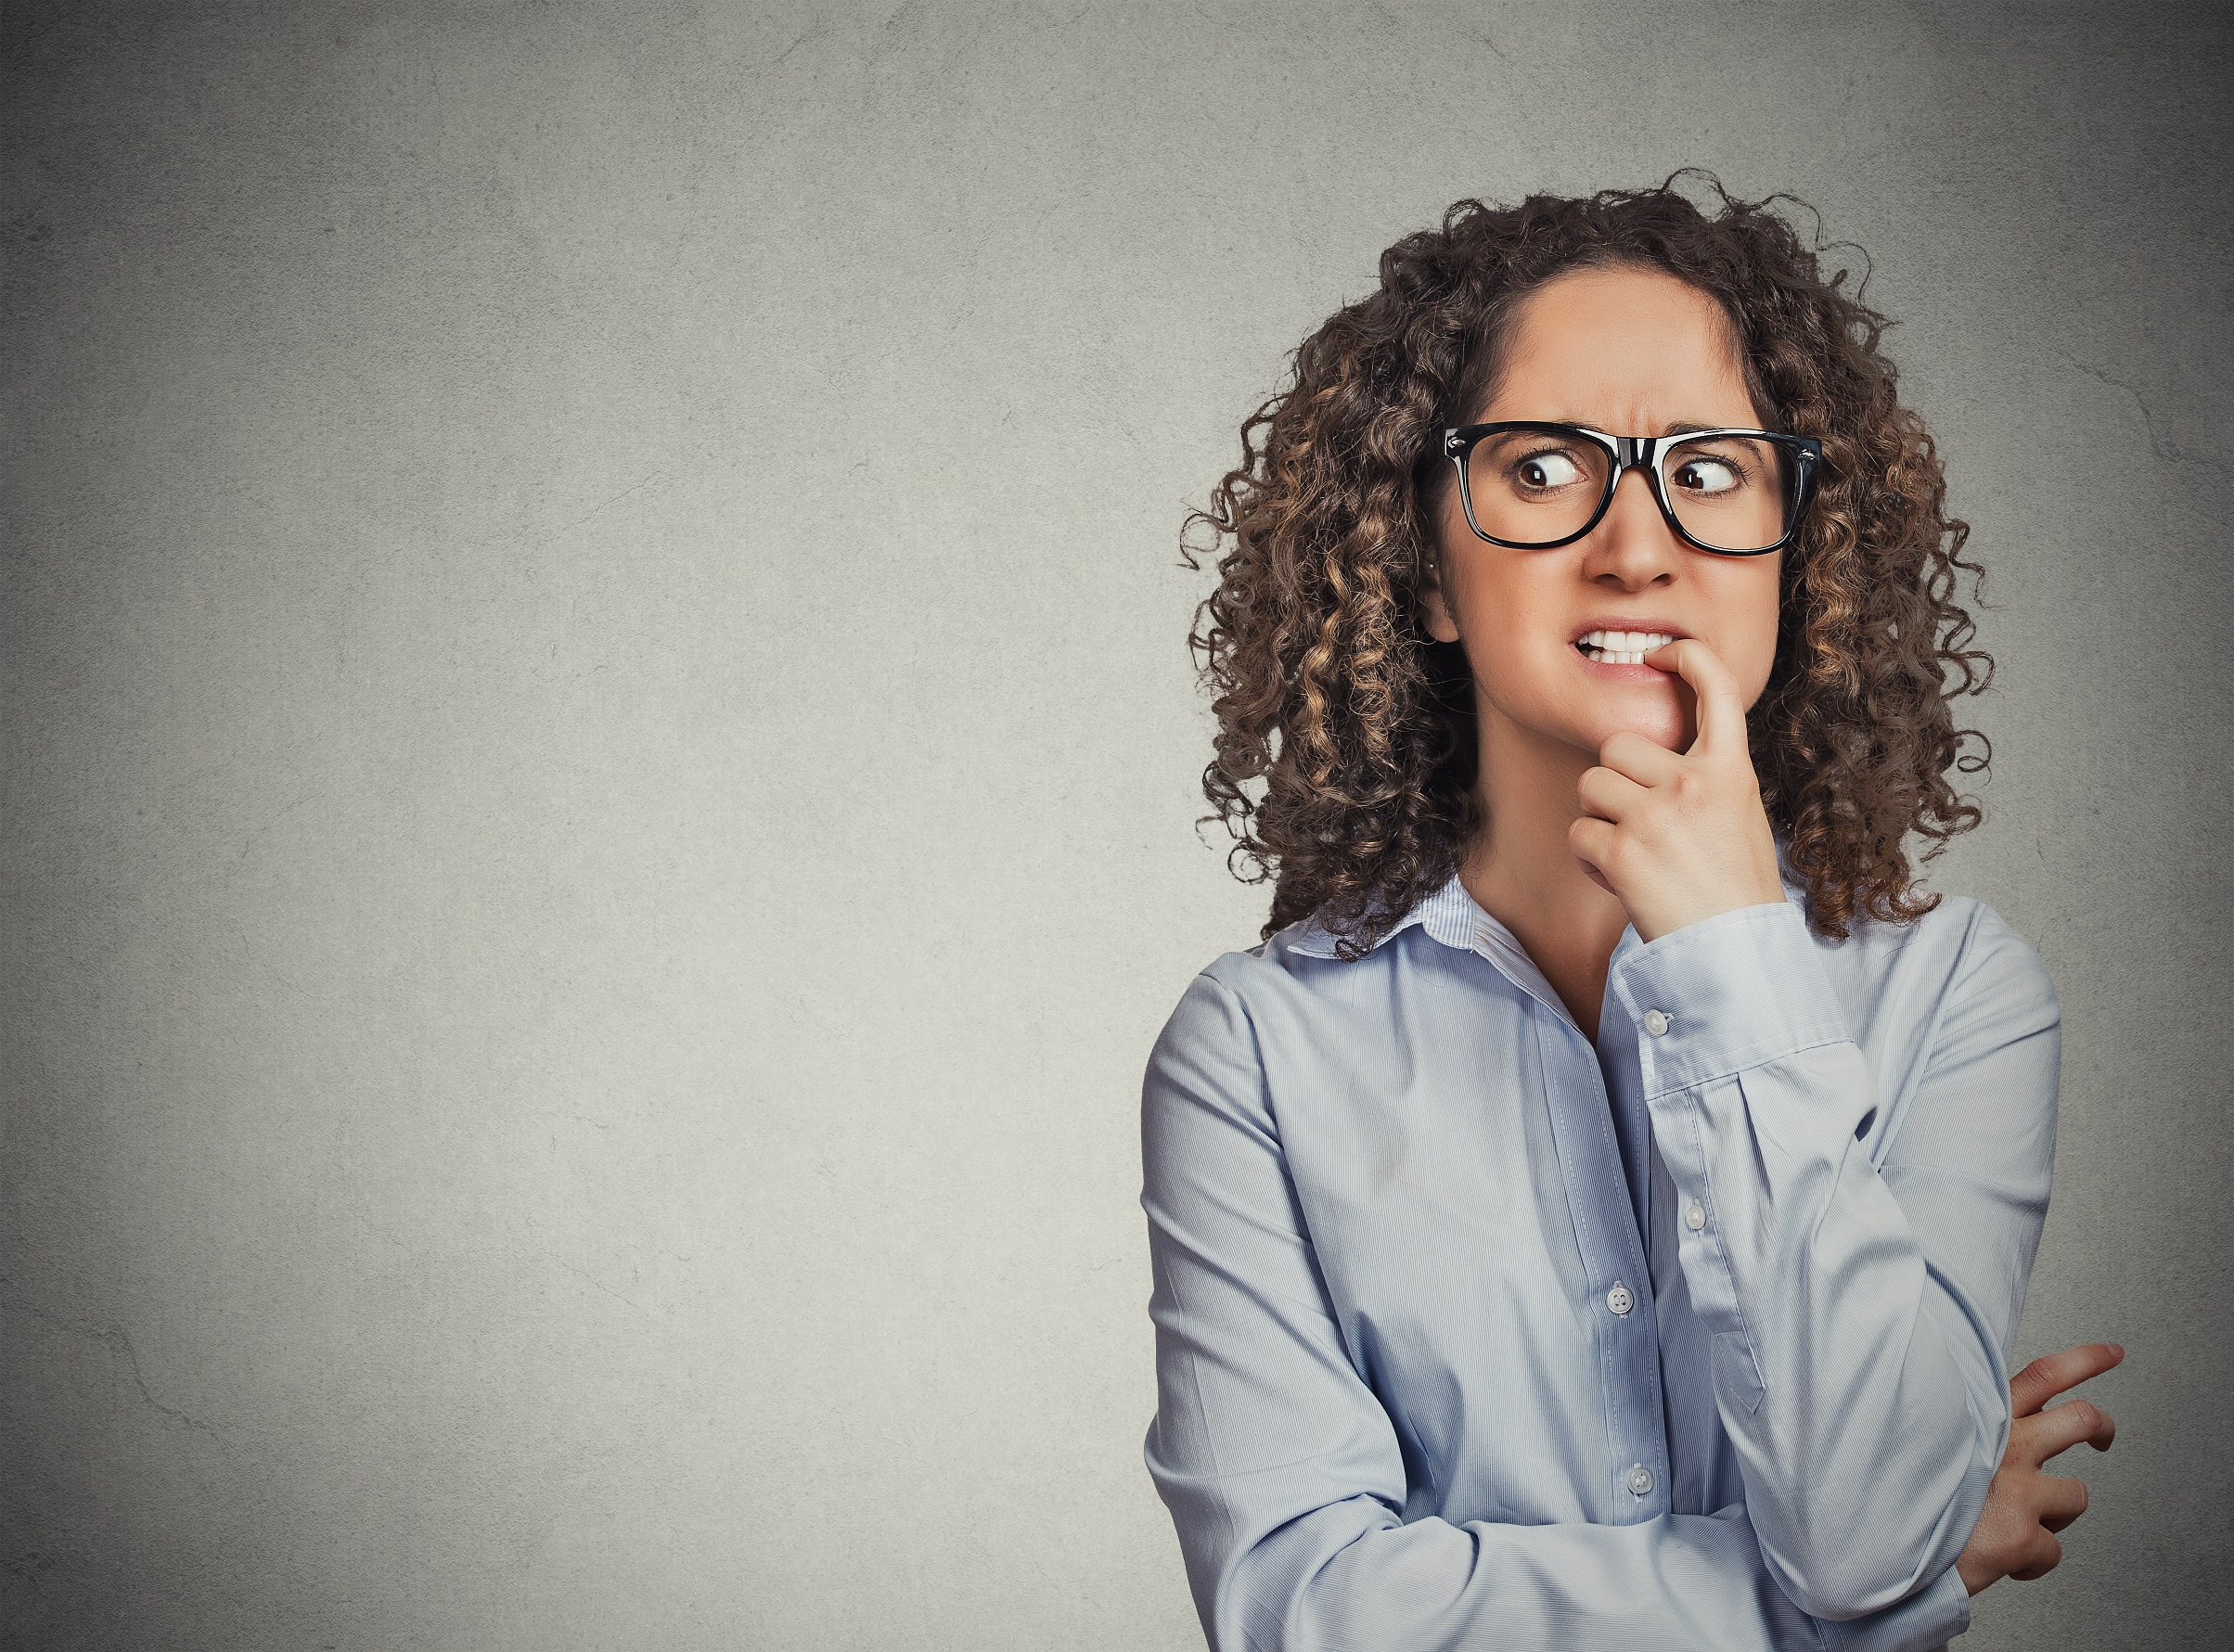 Ansiedade: o que é e como tratar